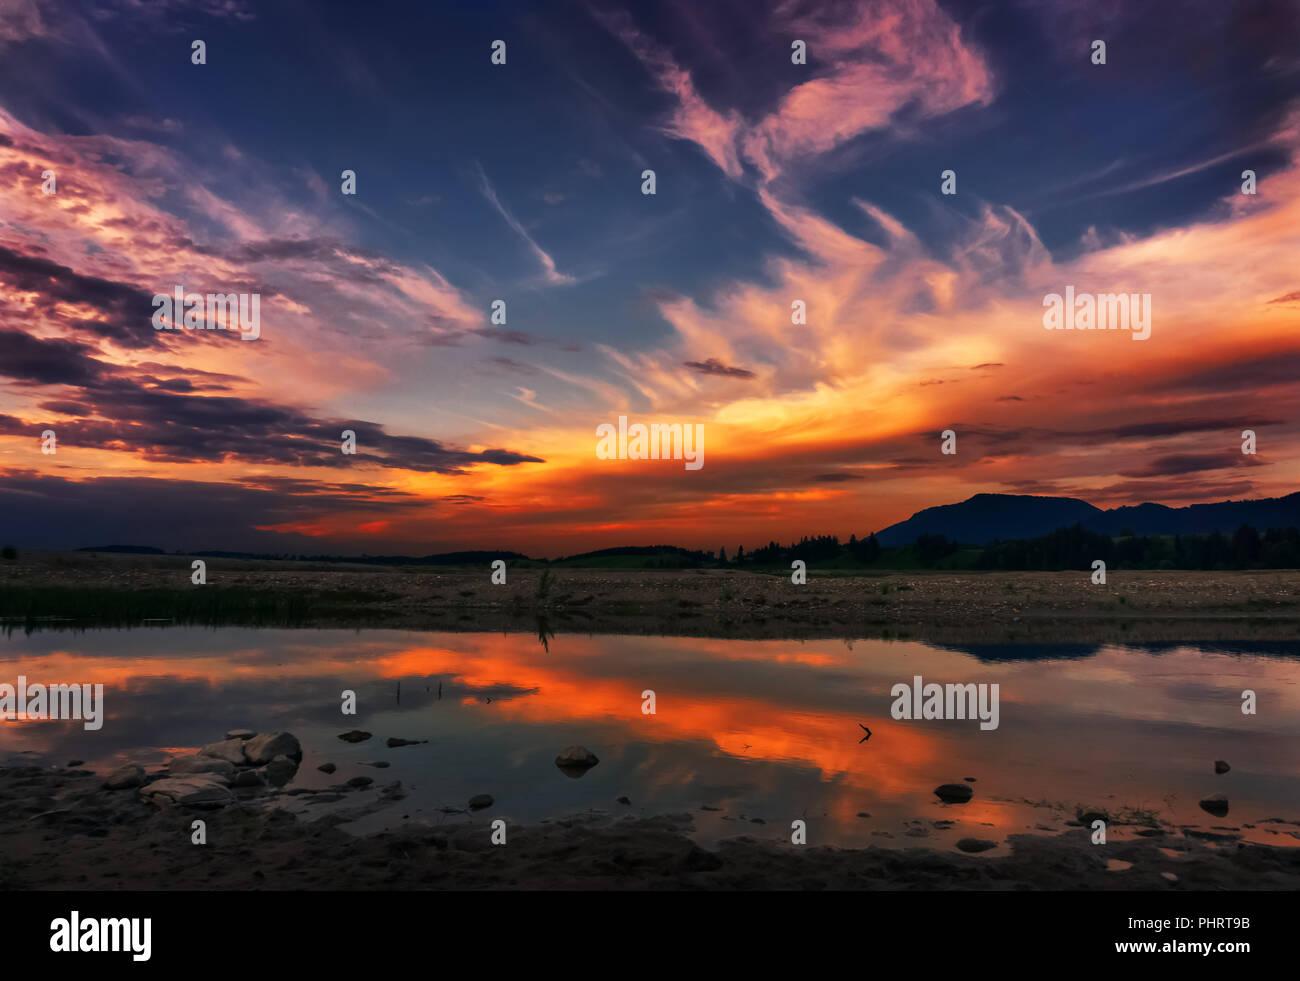 Sunset on the Forggensee (Schwangau, Allgäu, Bavaria, Germany) - Stock Image